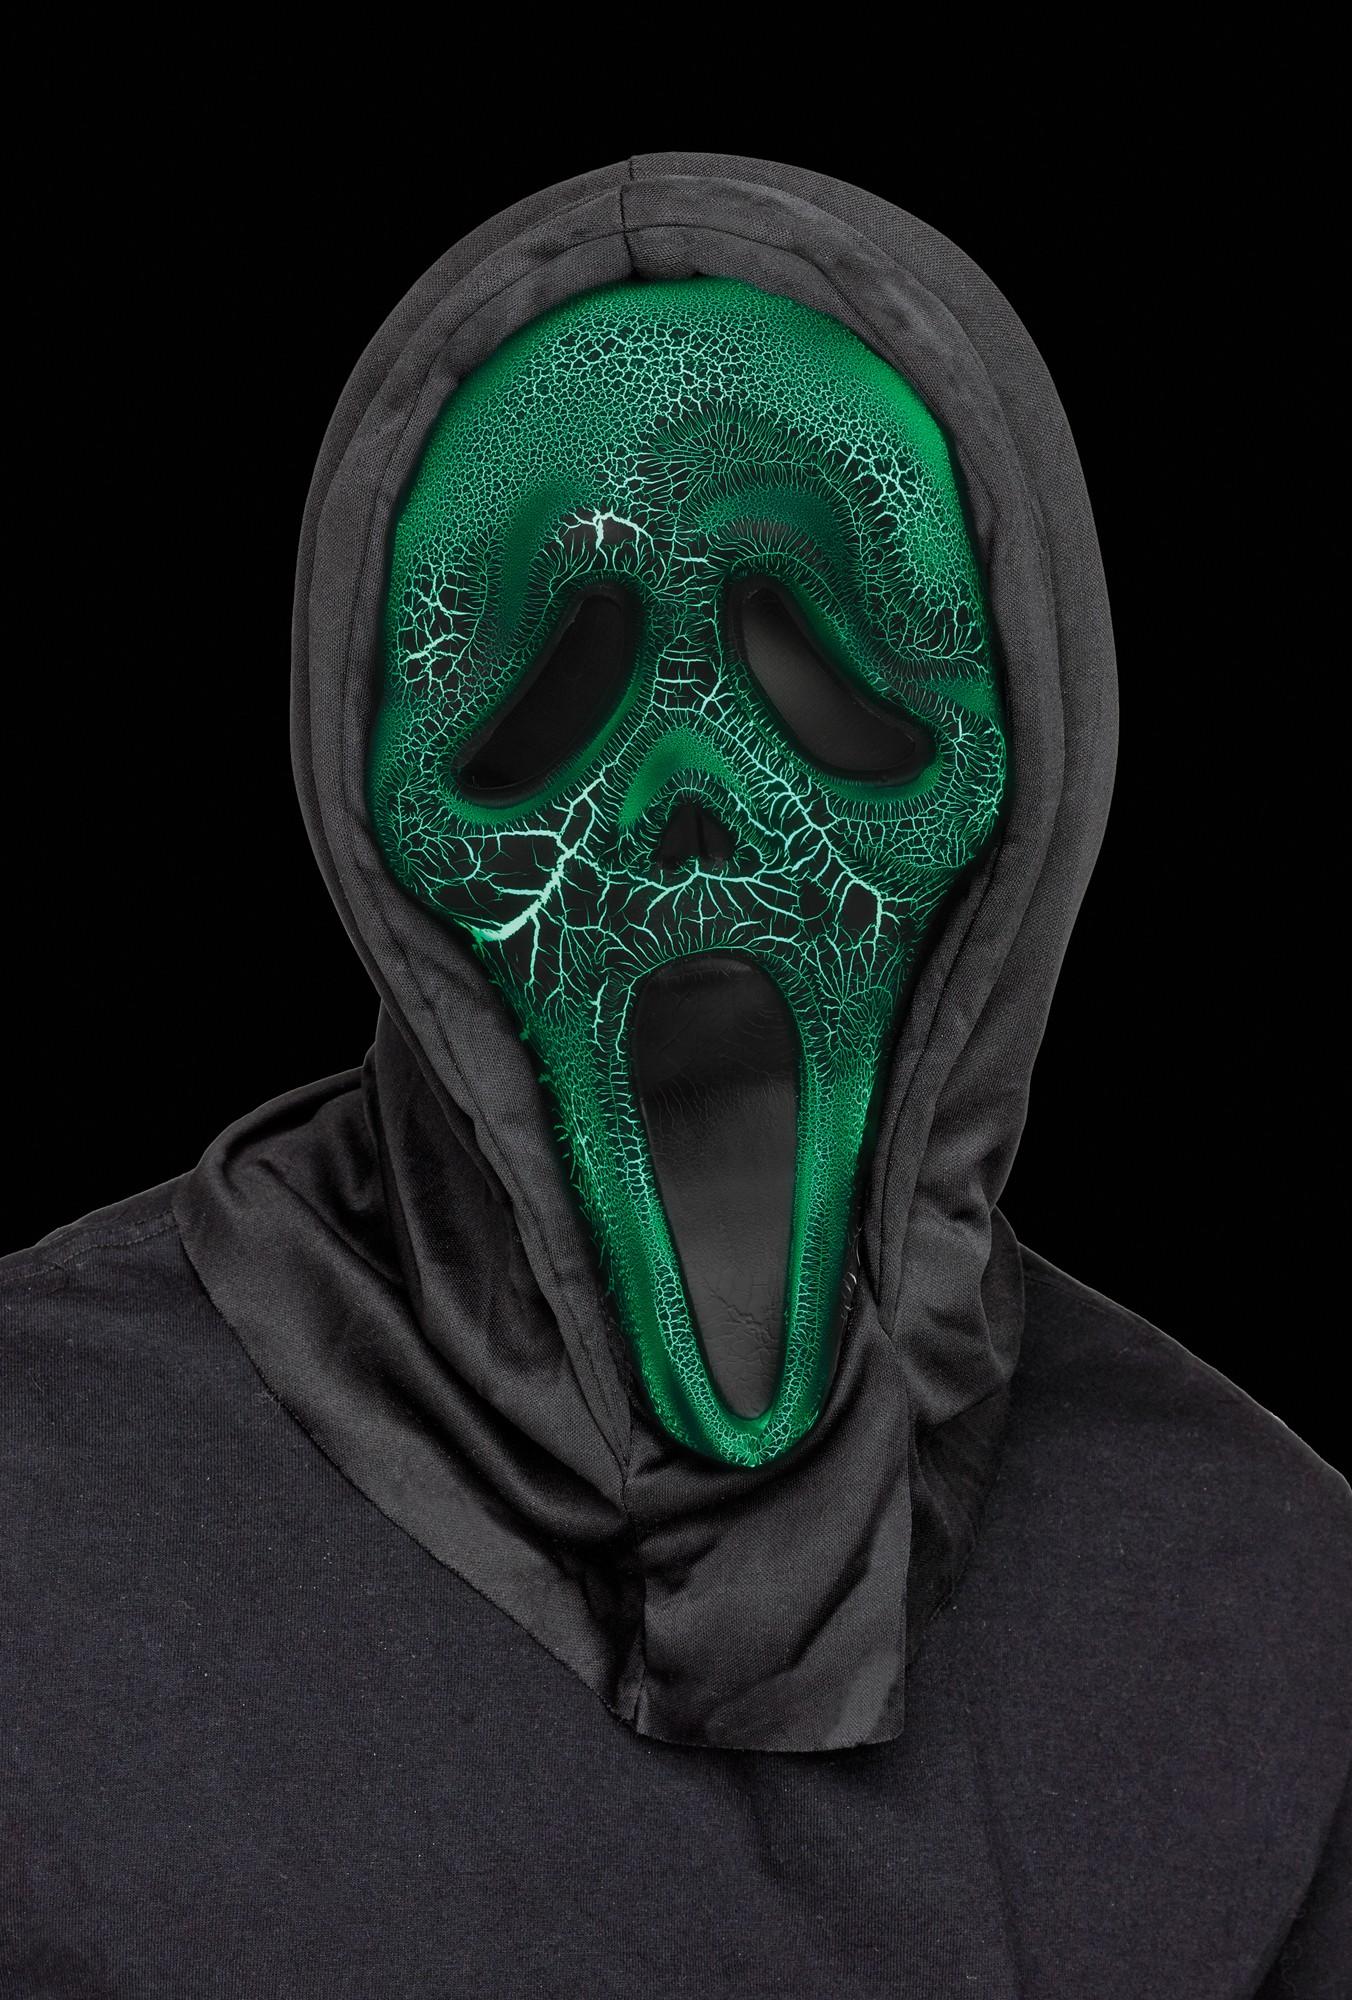 Smoldering Fx Charred Burnt Ghostface Ghost Face Scream Light Up ...